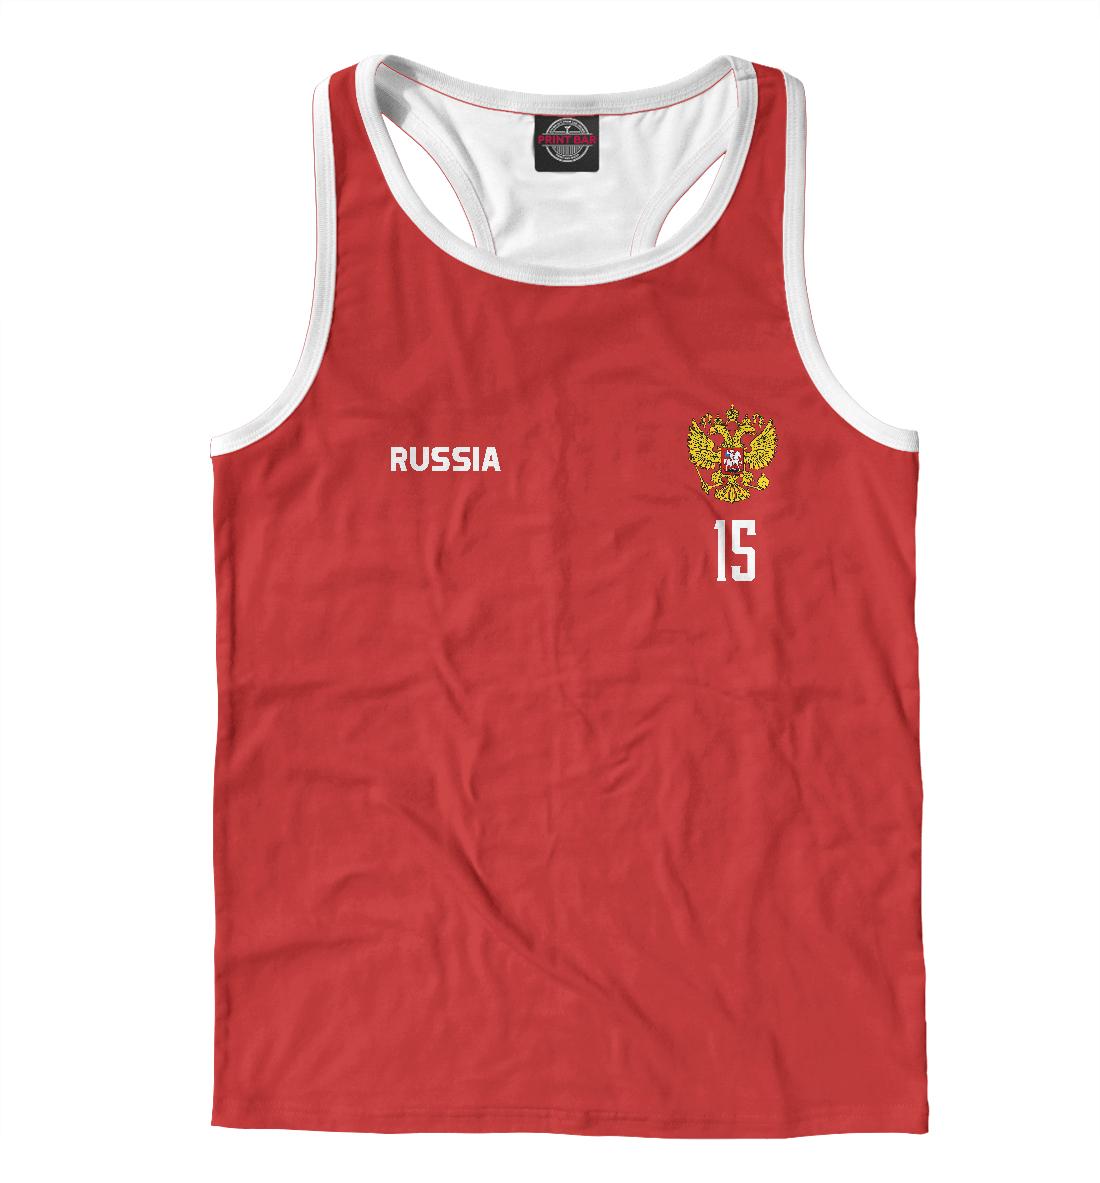 Купить Россия Миранчук, Printbar, Майки борцовки, FNS-534223-mayb-2